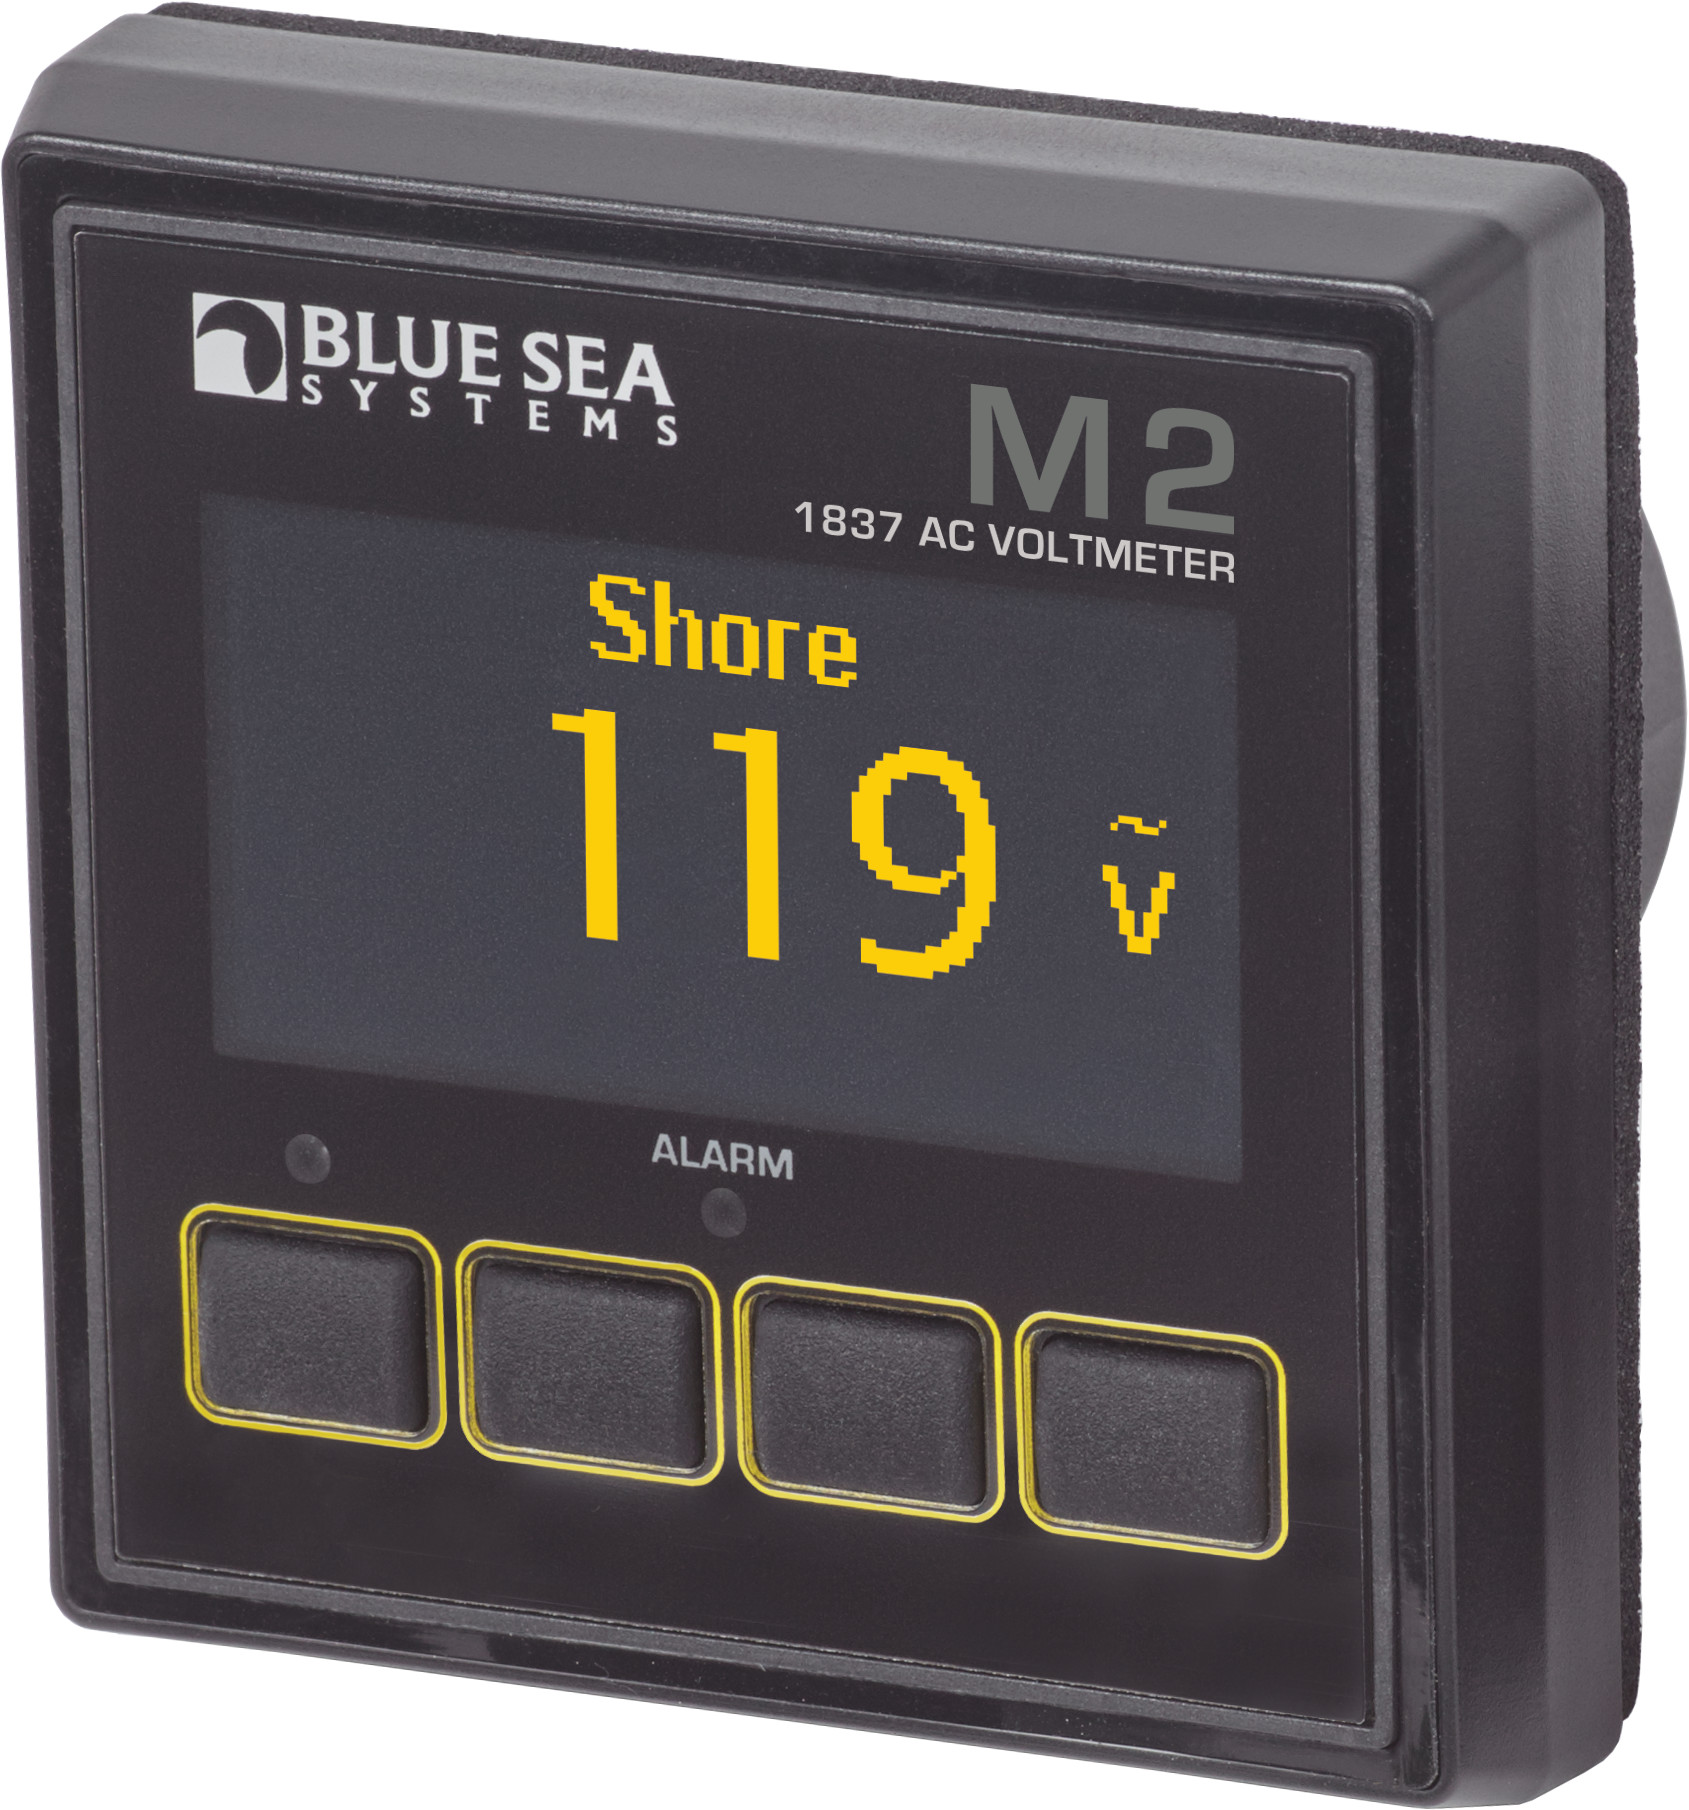 digital ac ammeter circuit diagram 2006 cobalt ss radio wiring m2 voltmeter blue sea systems